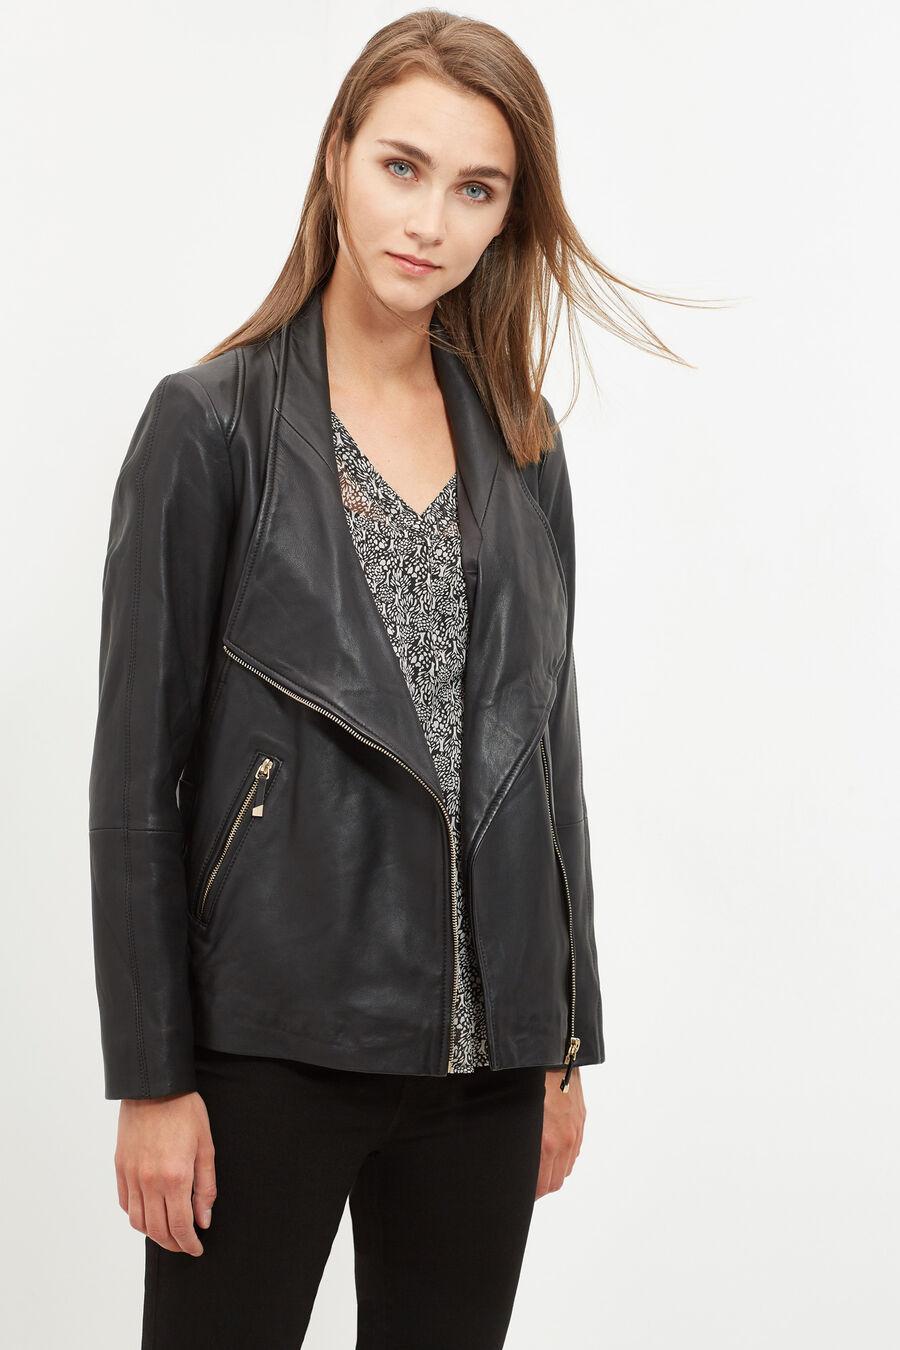 Perfect jacket